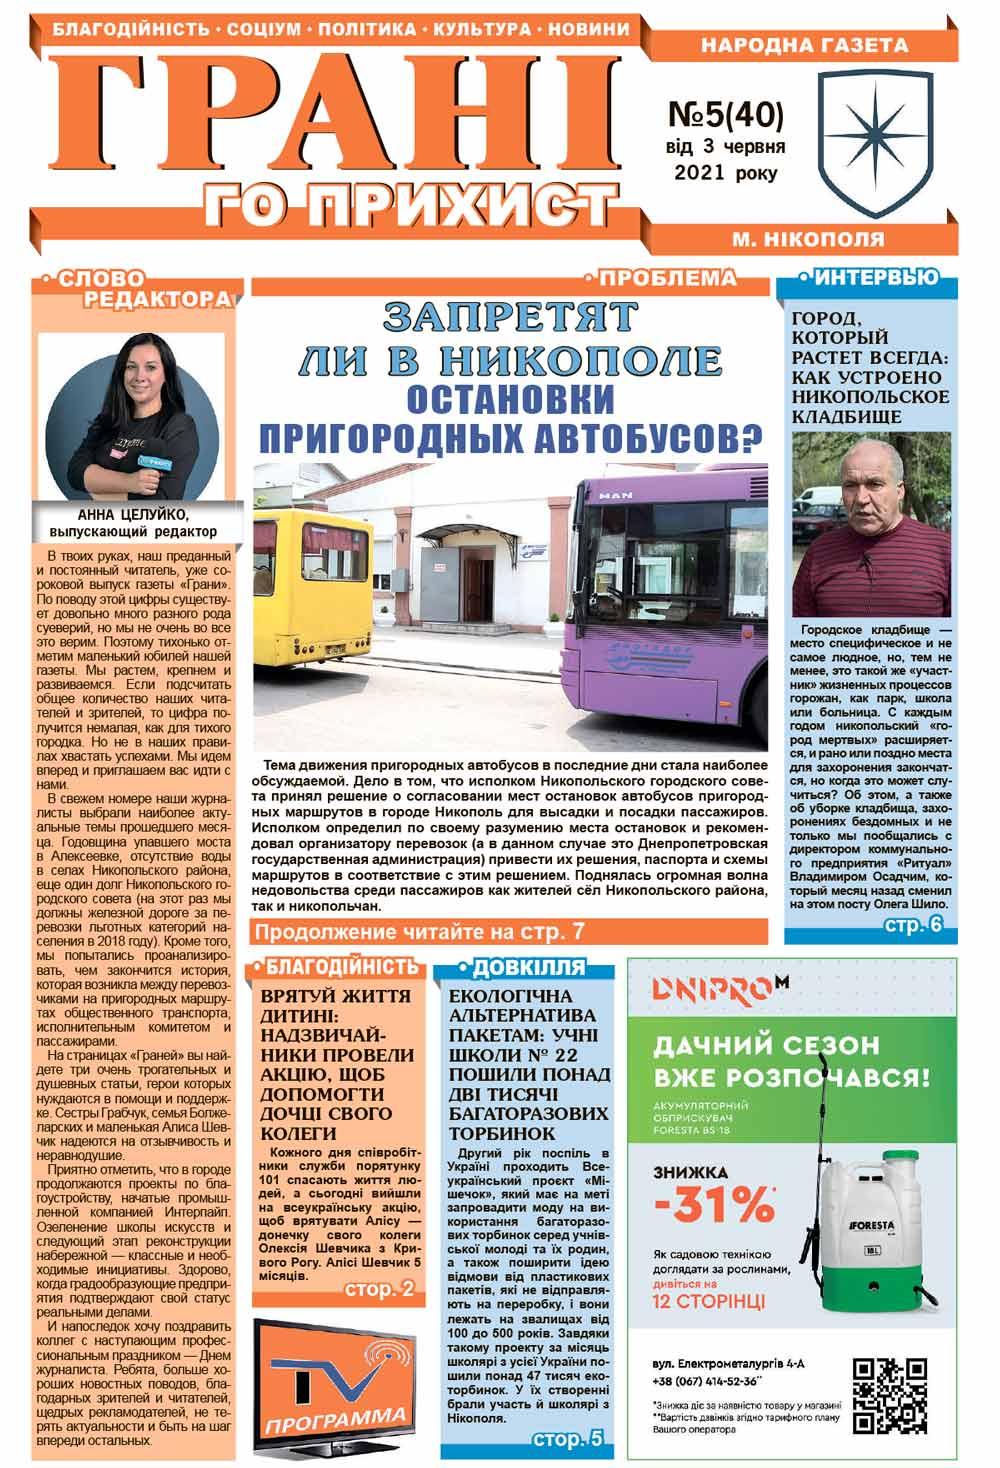 Газета «Грані», выпуск №40 | Прихист